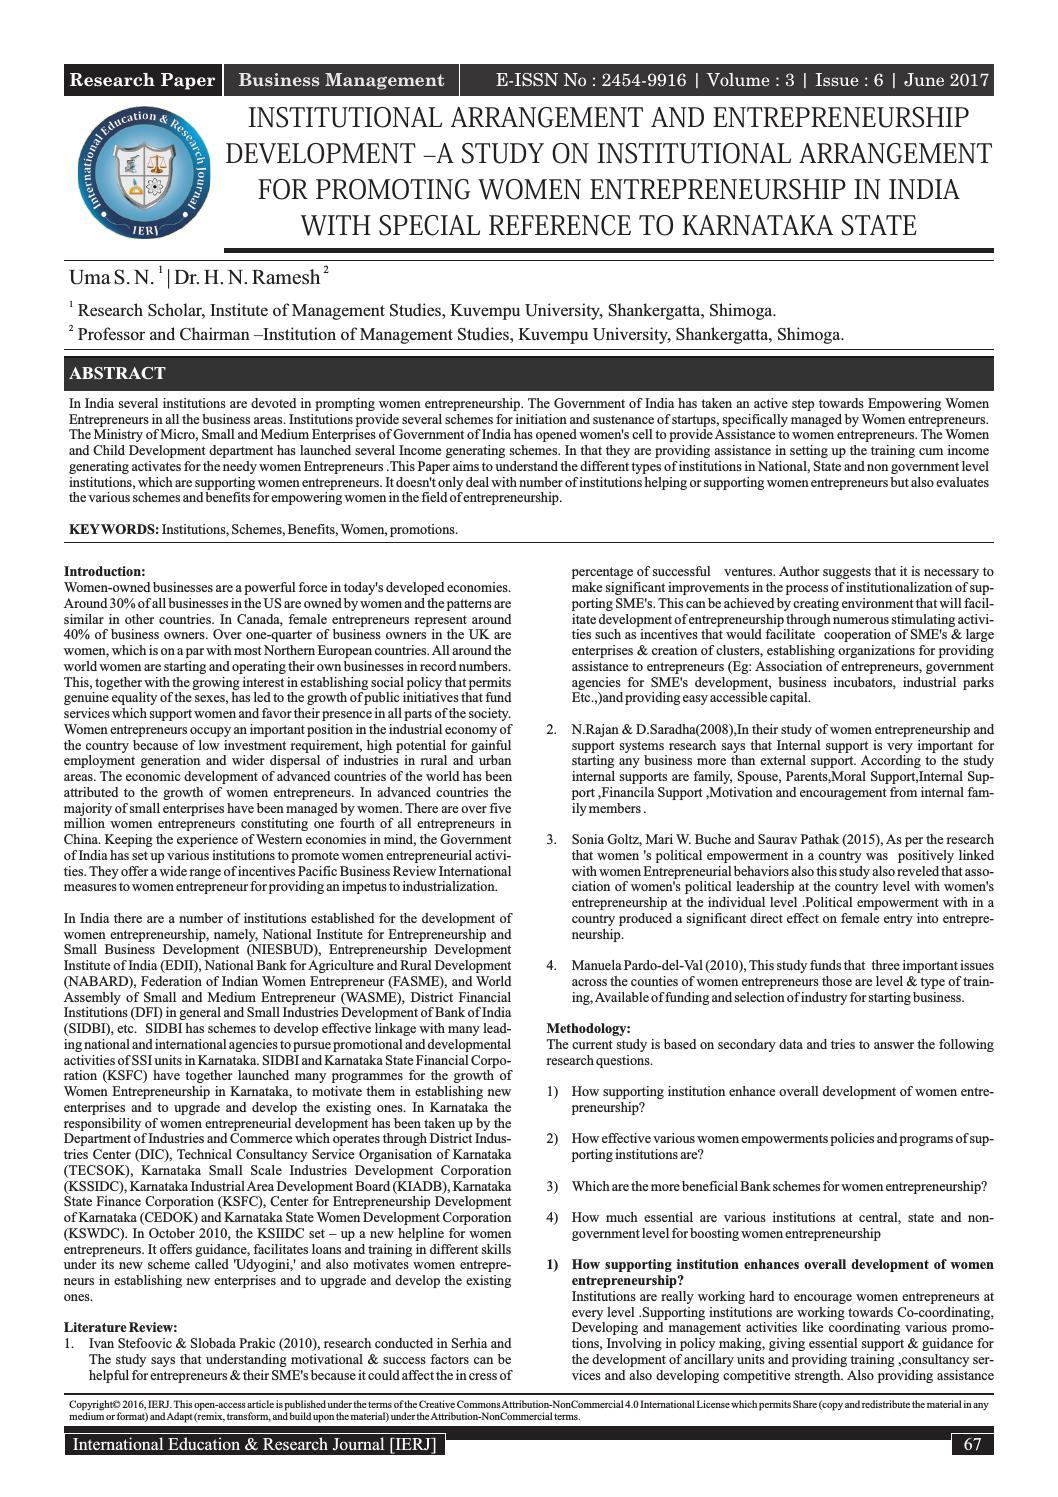 institutional arrangement and entrepreneurship development